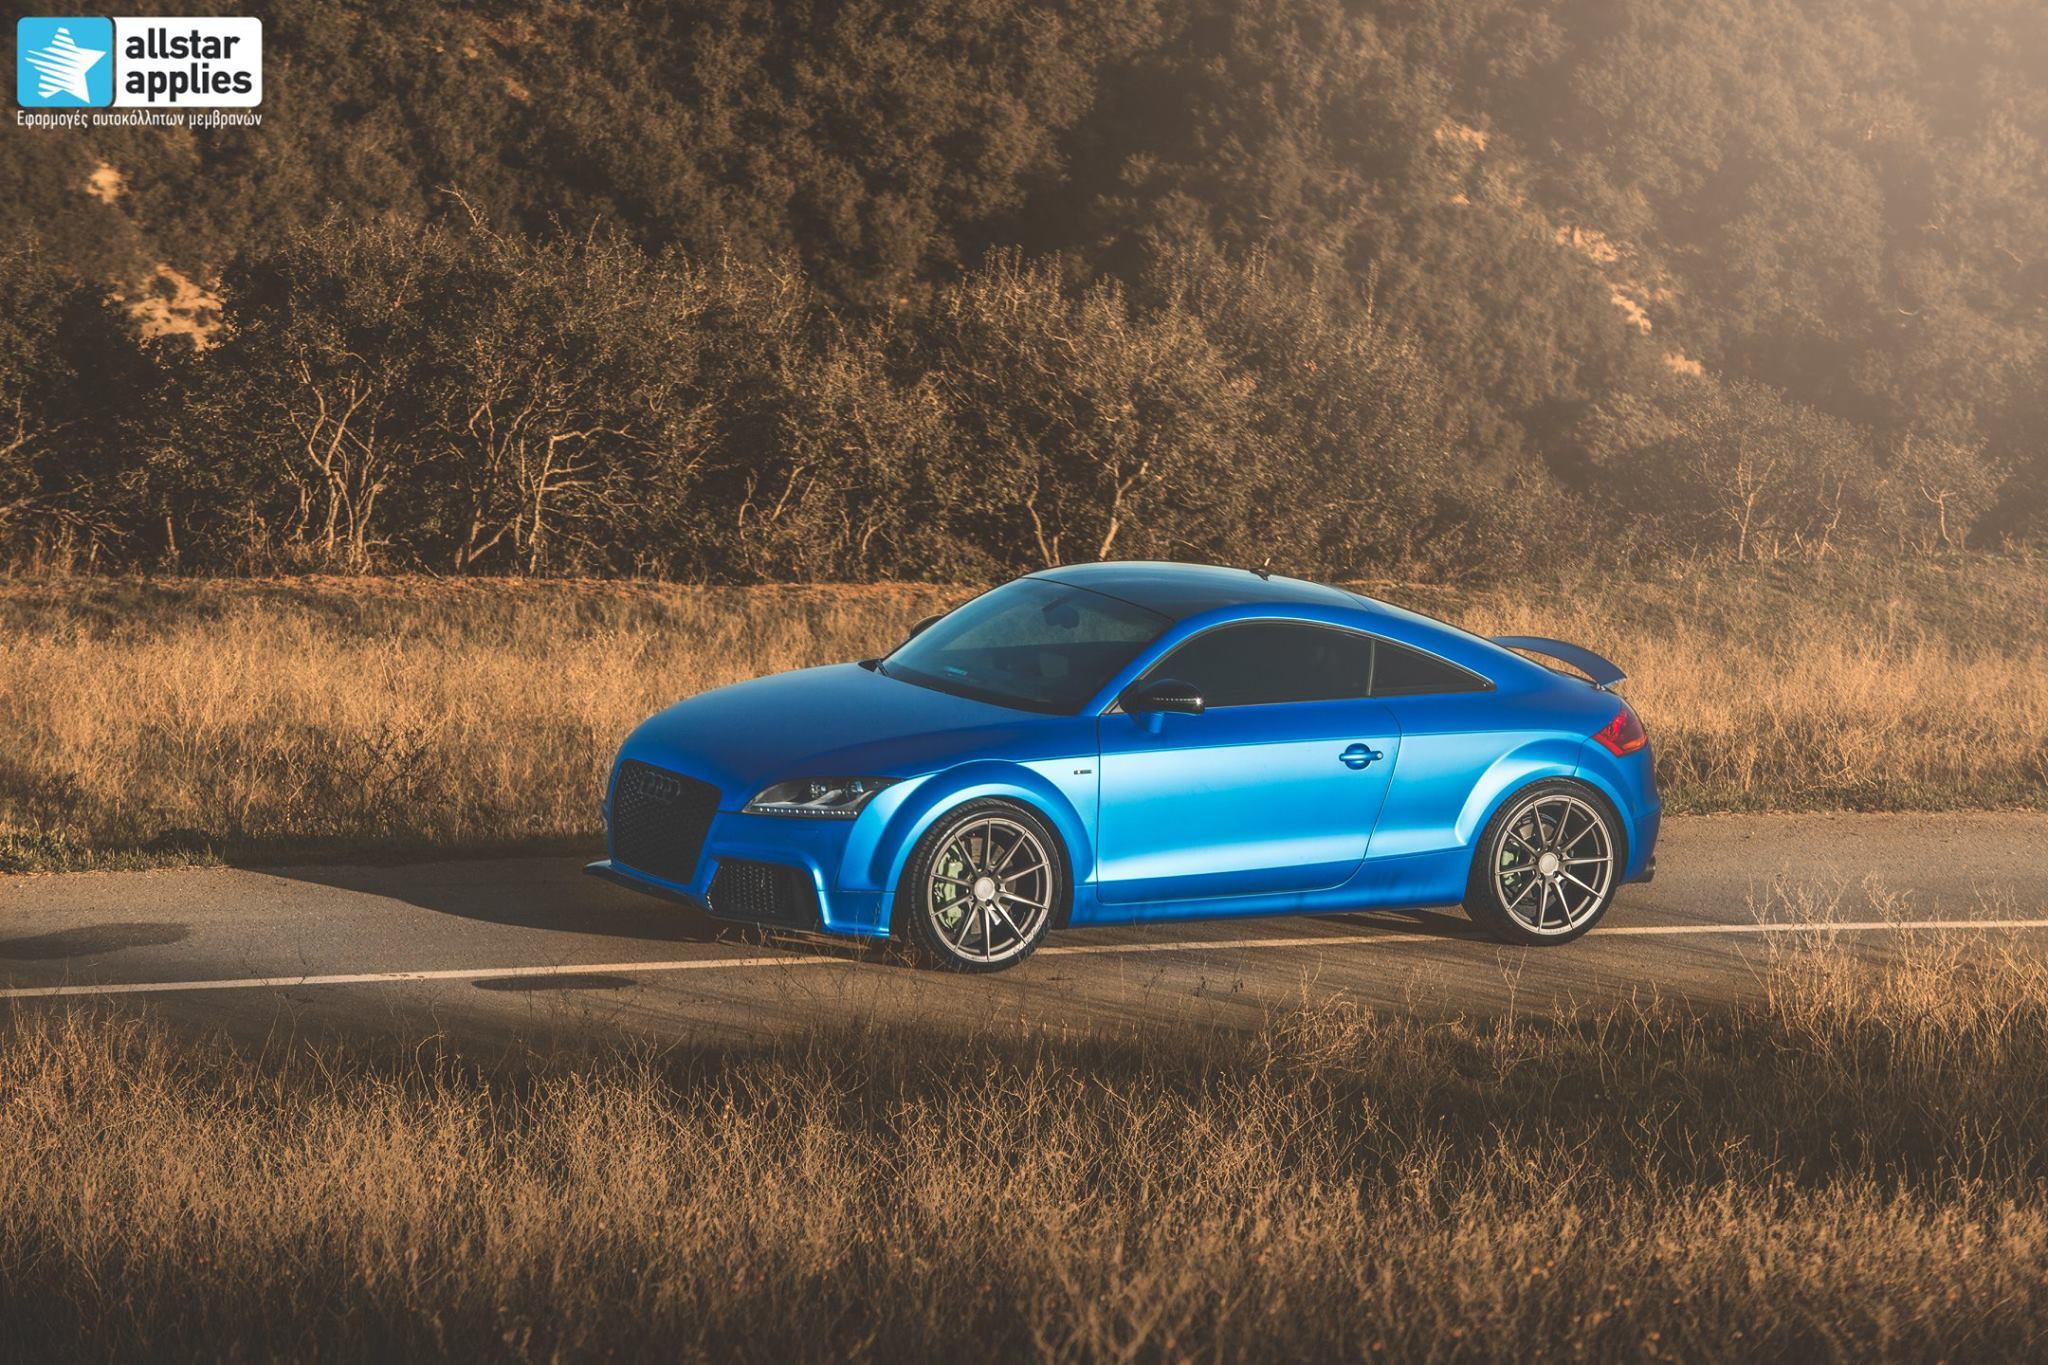 Audi TT - Matte Iced Blue + Ispiri Wheels FFR1 Matte (1)